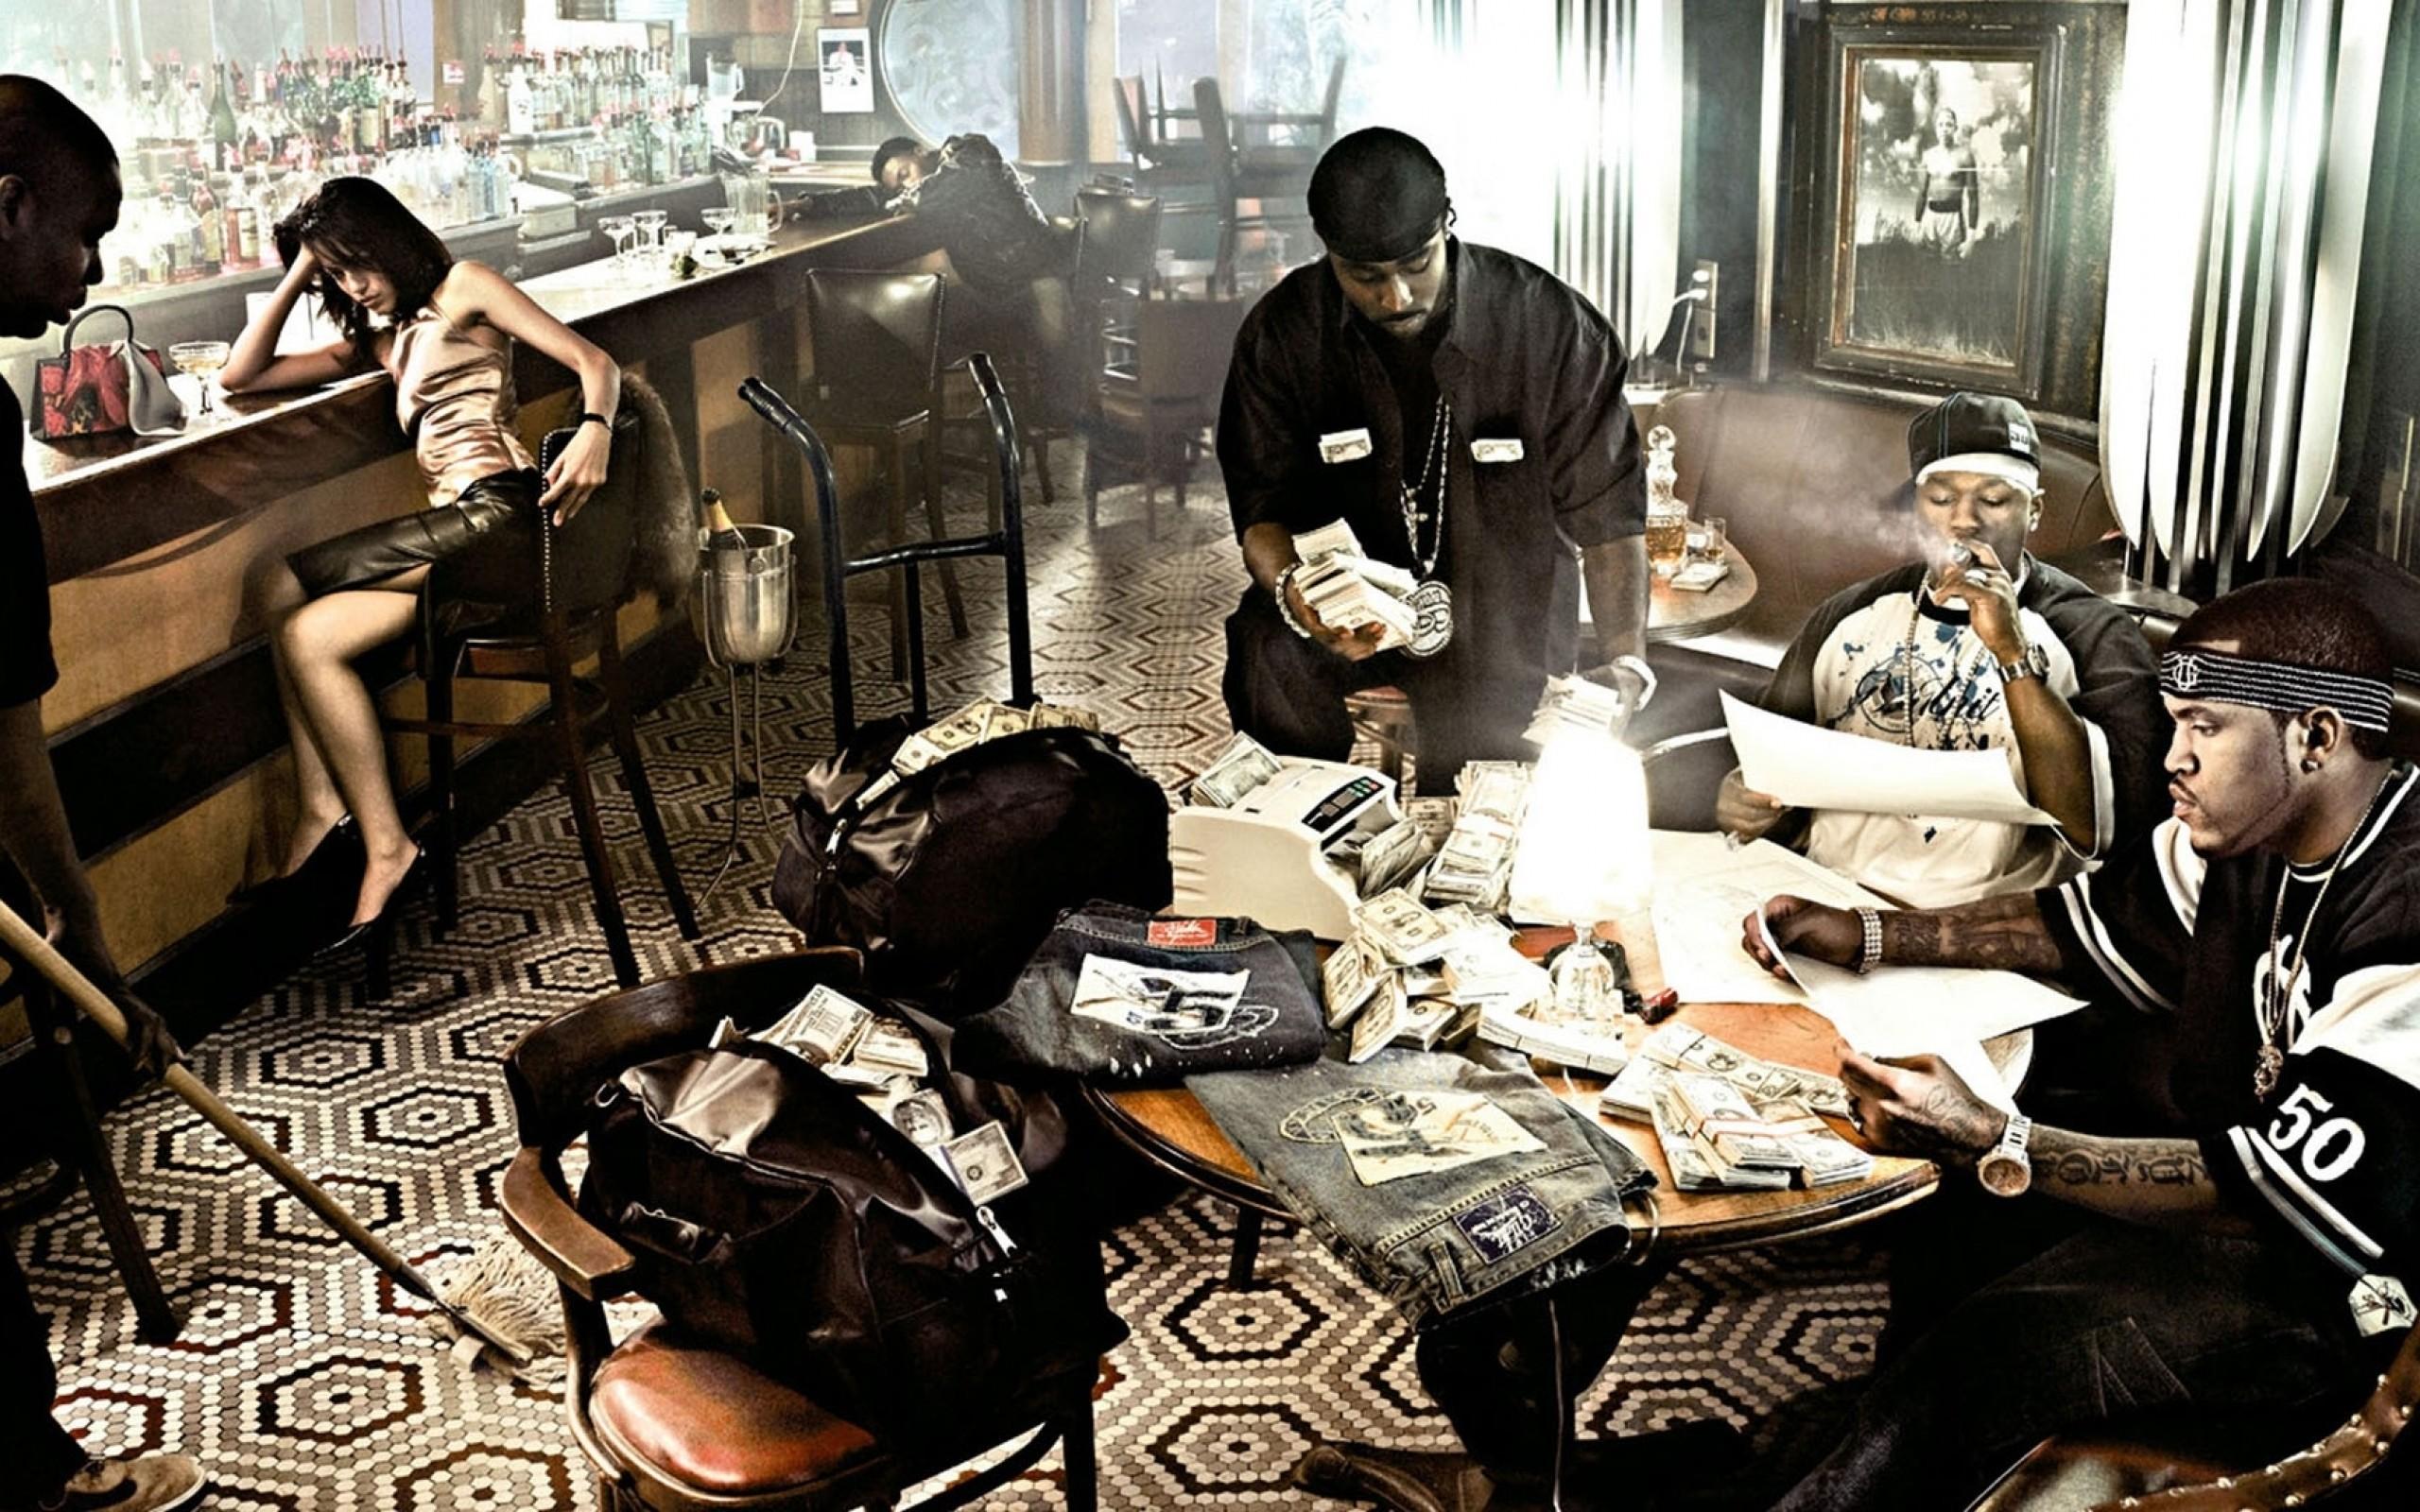 Res: 2560x1600, Gangster Rap Wallpaper G unit 50 cent gangsta rap